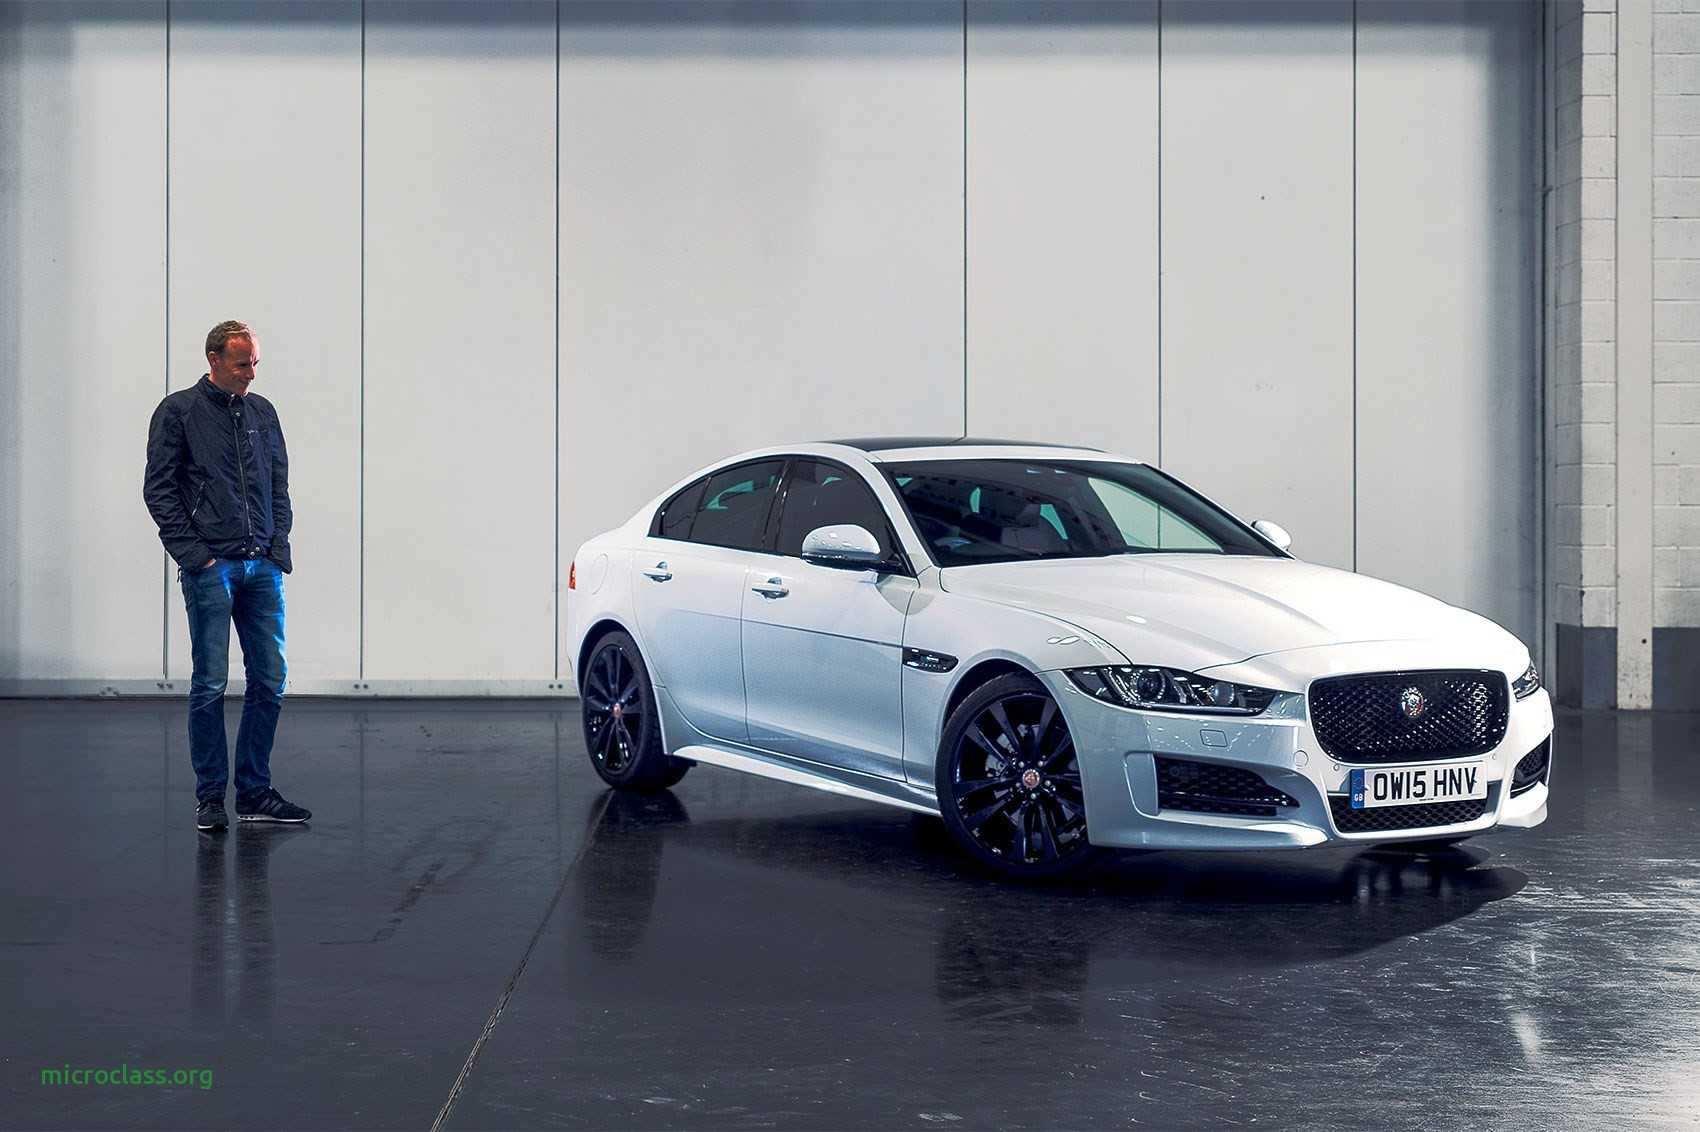 29 Gallery of Jaguar Xf Facelift 2020 Research New for Jaguar Xf Facelift 2020